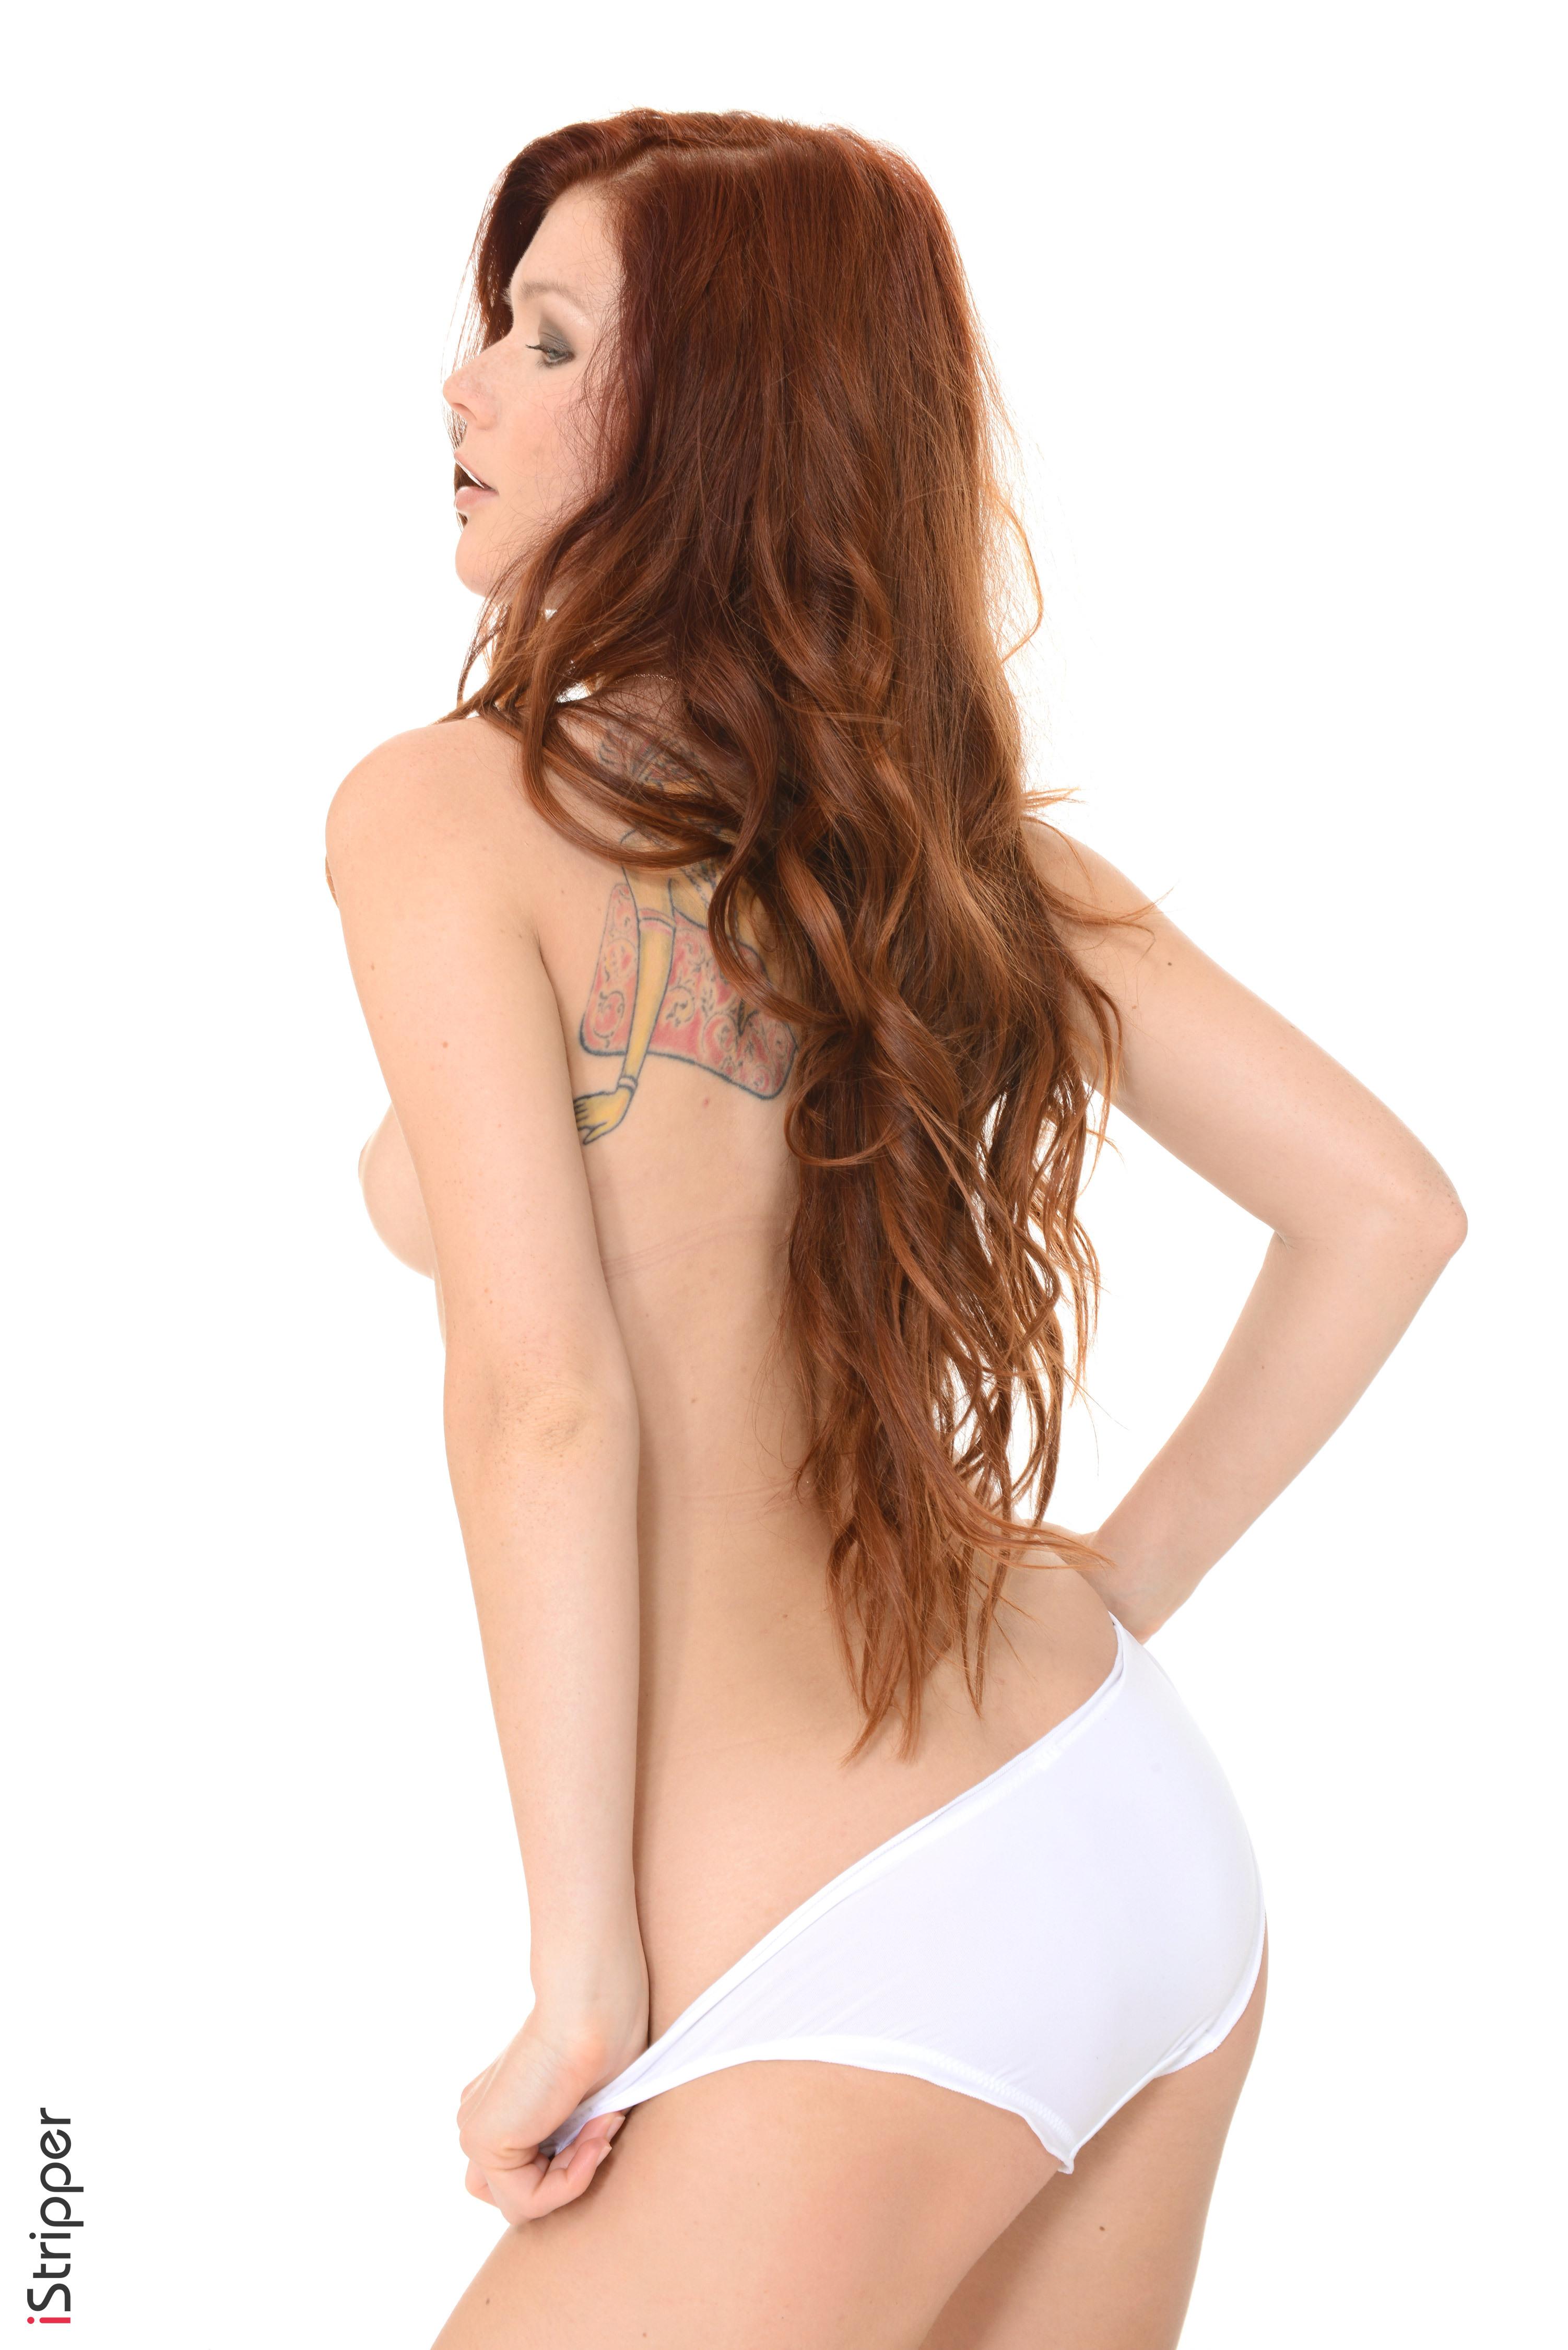 nude models wallpapers